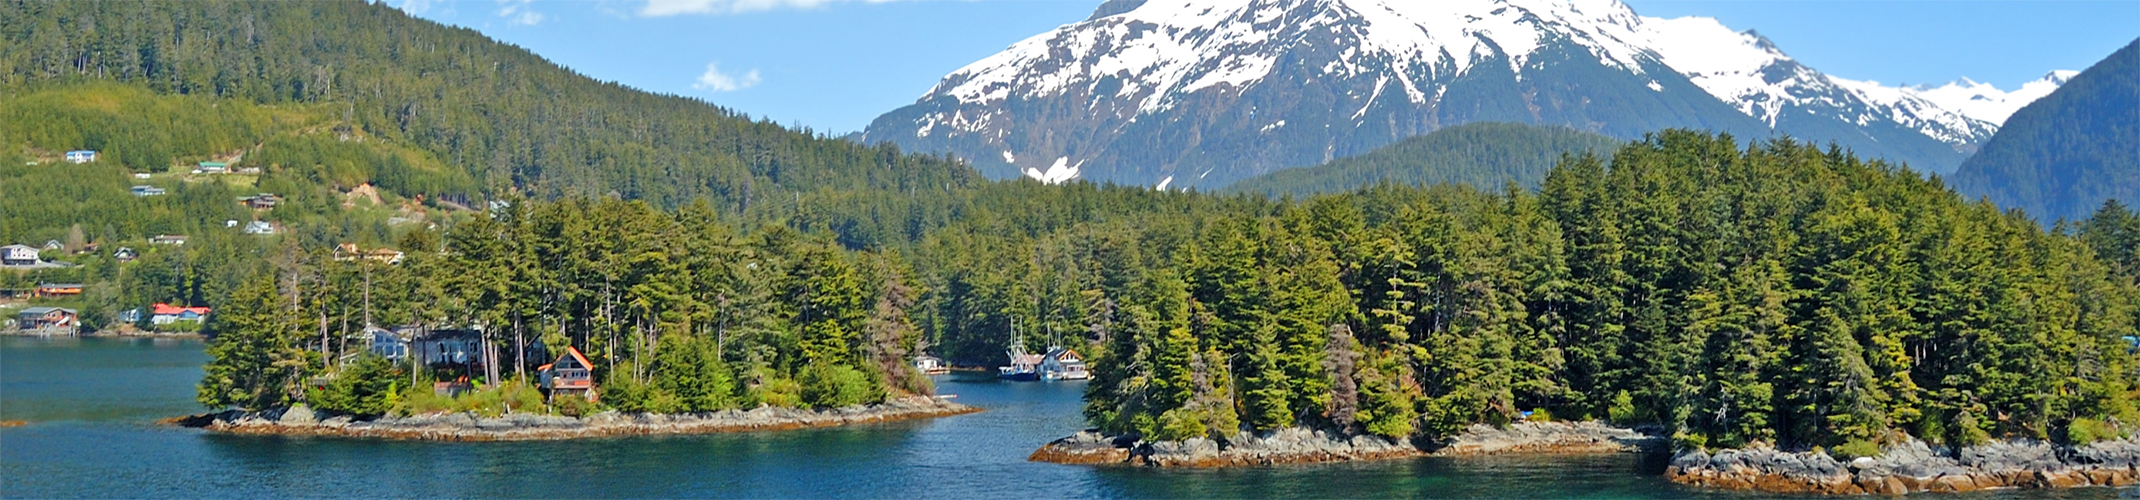 Juneau to Sitka itinerary